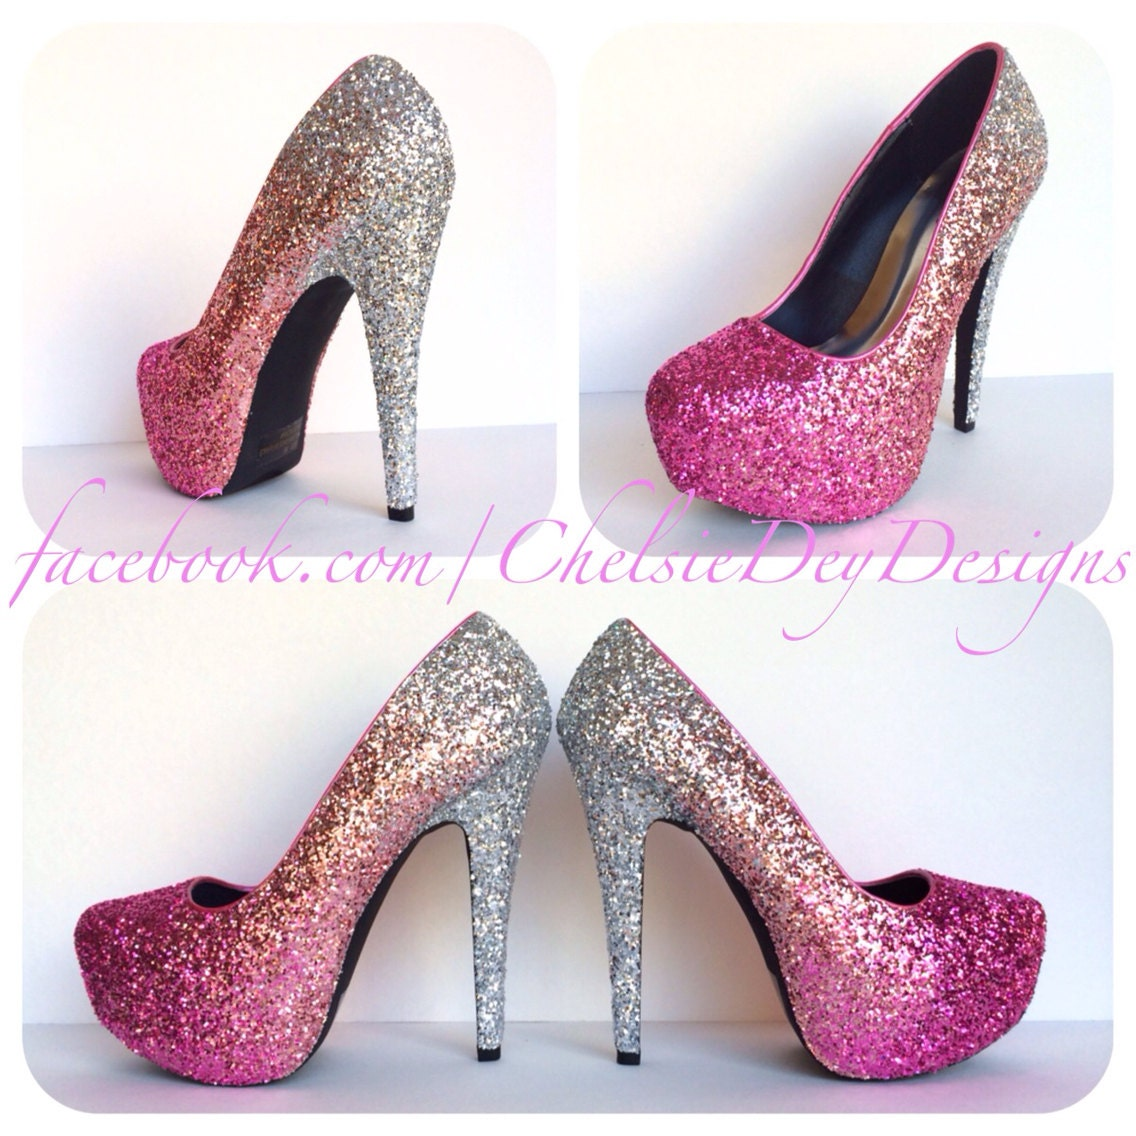 6655f5ca570 Glitter High Heels - Hot Pink Pumps - Light Pink Silver Ombre Platform  Pumps - Sparkly Wedding Pumps